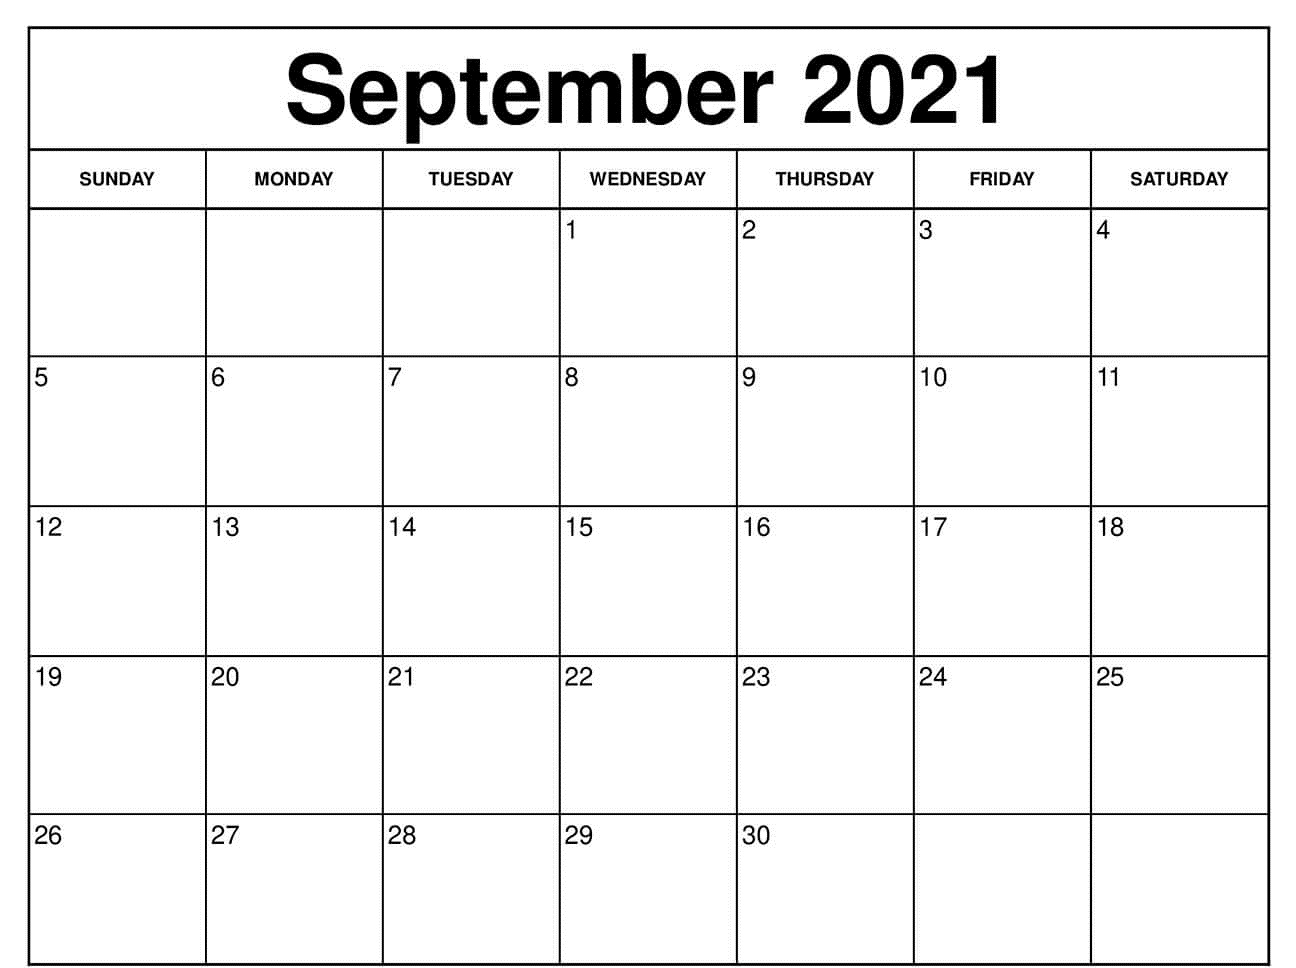 Blank September 2021 calendar With Holidays